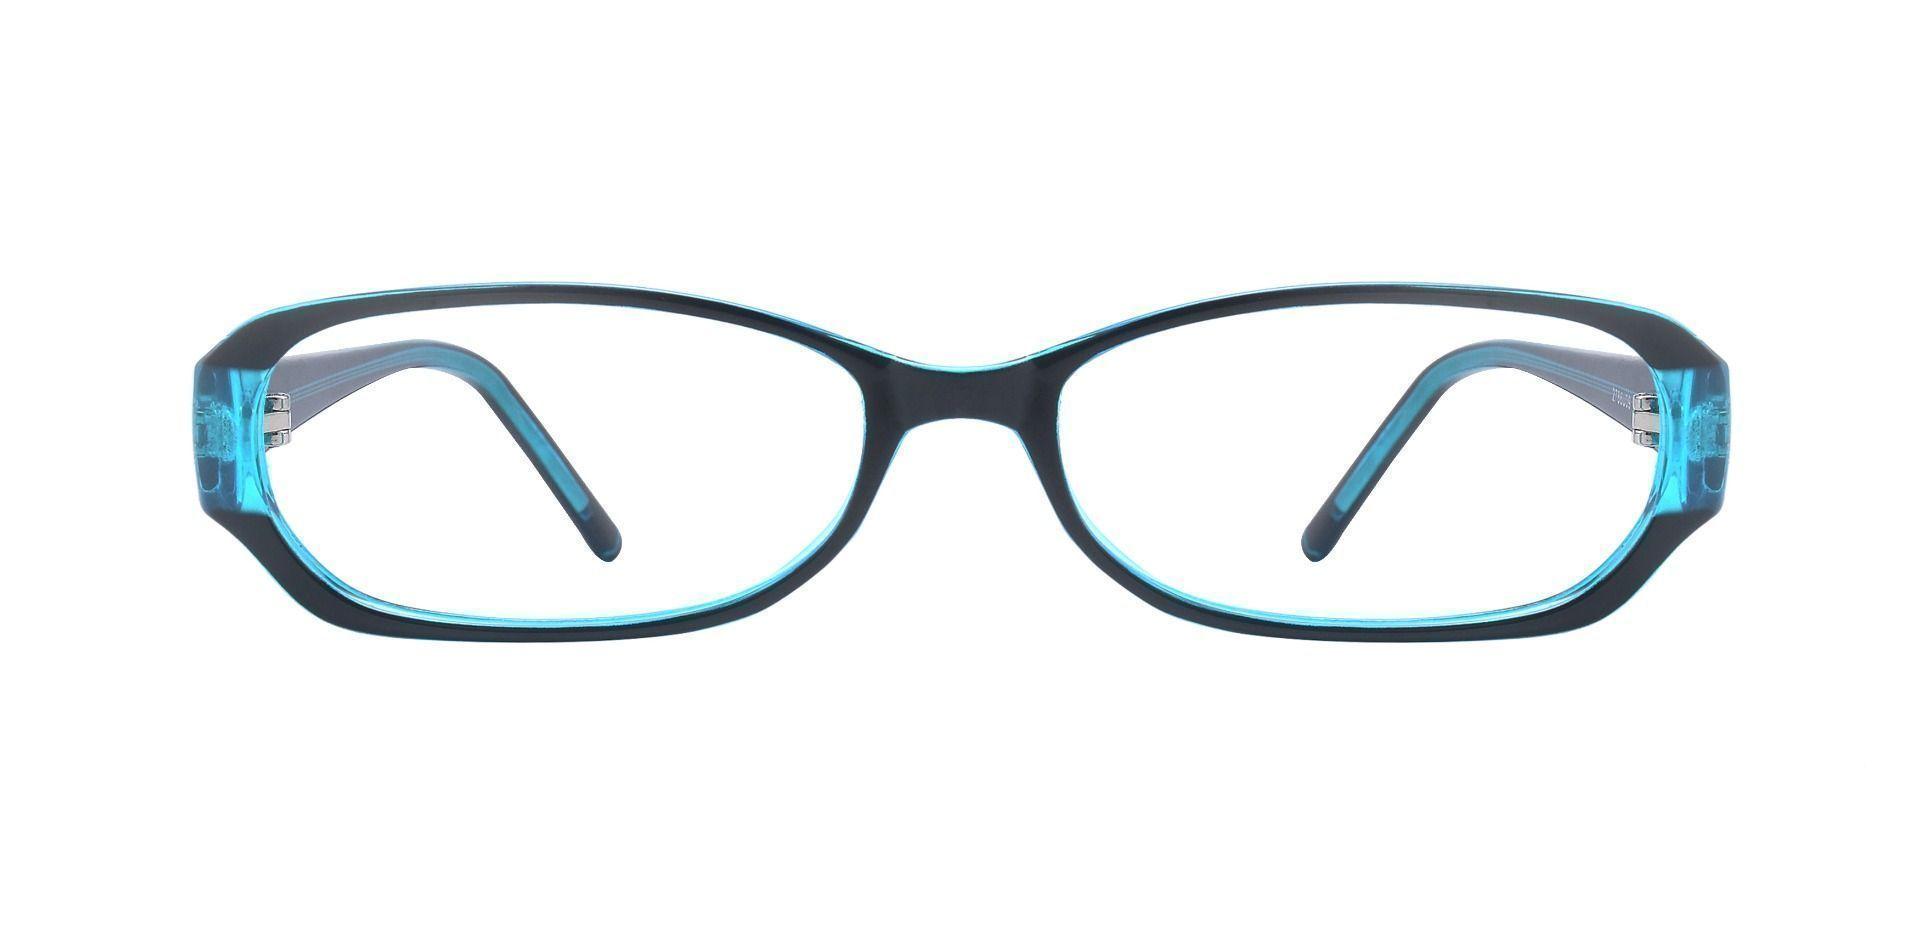 Nairobi Oval Blue Light Blocking Glasses - The Frame Is Black And Blue